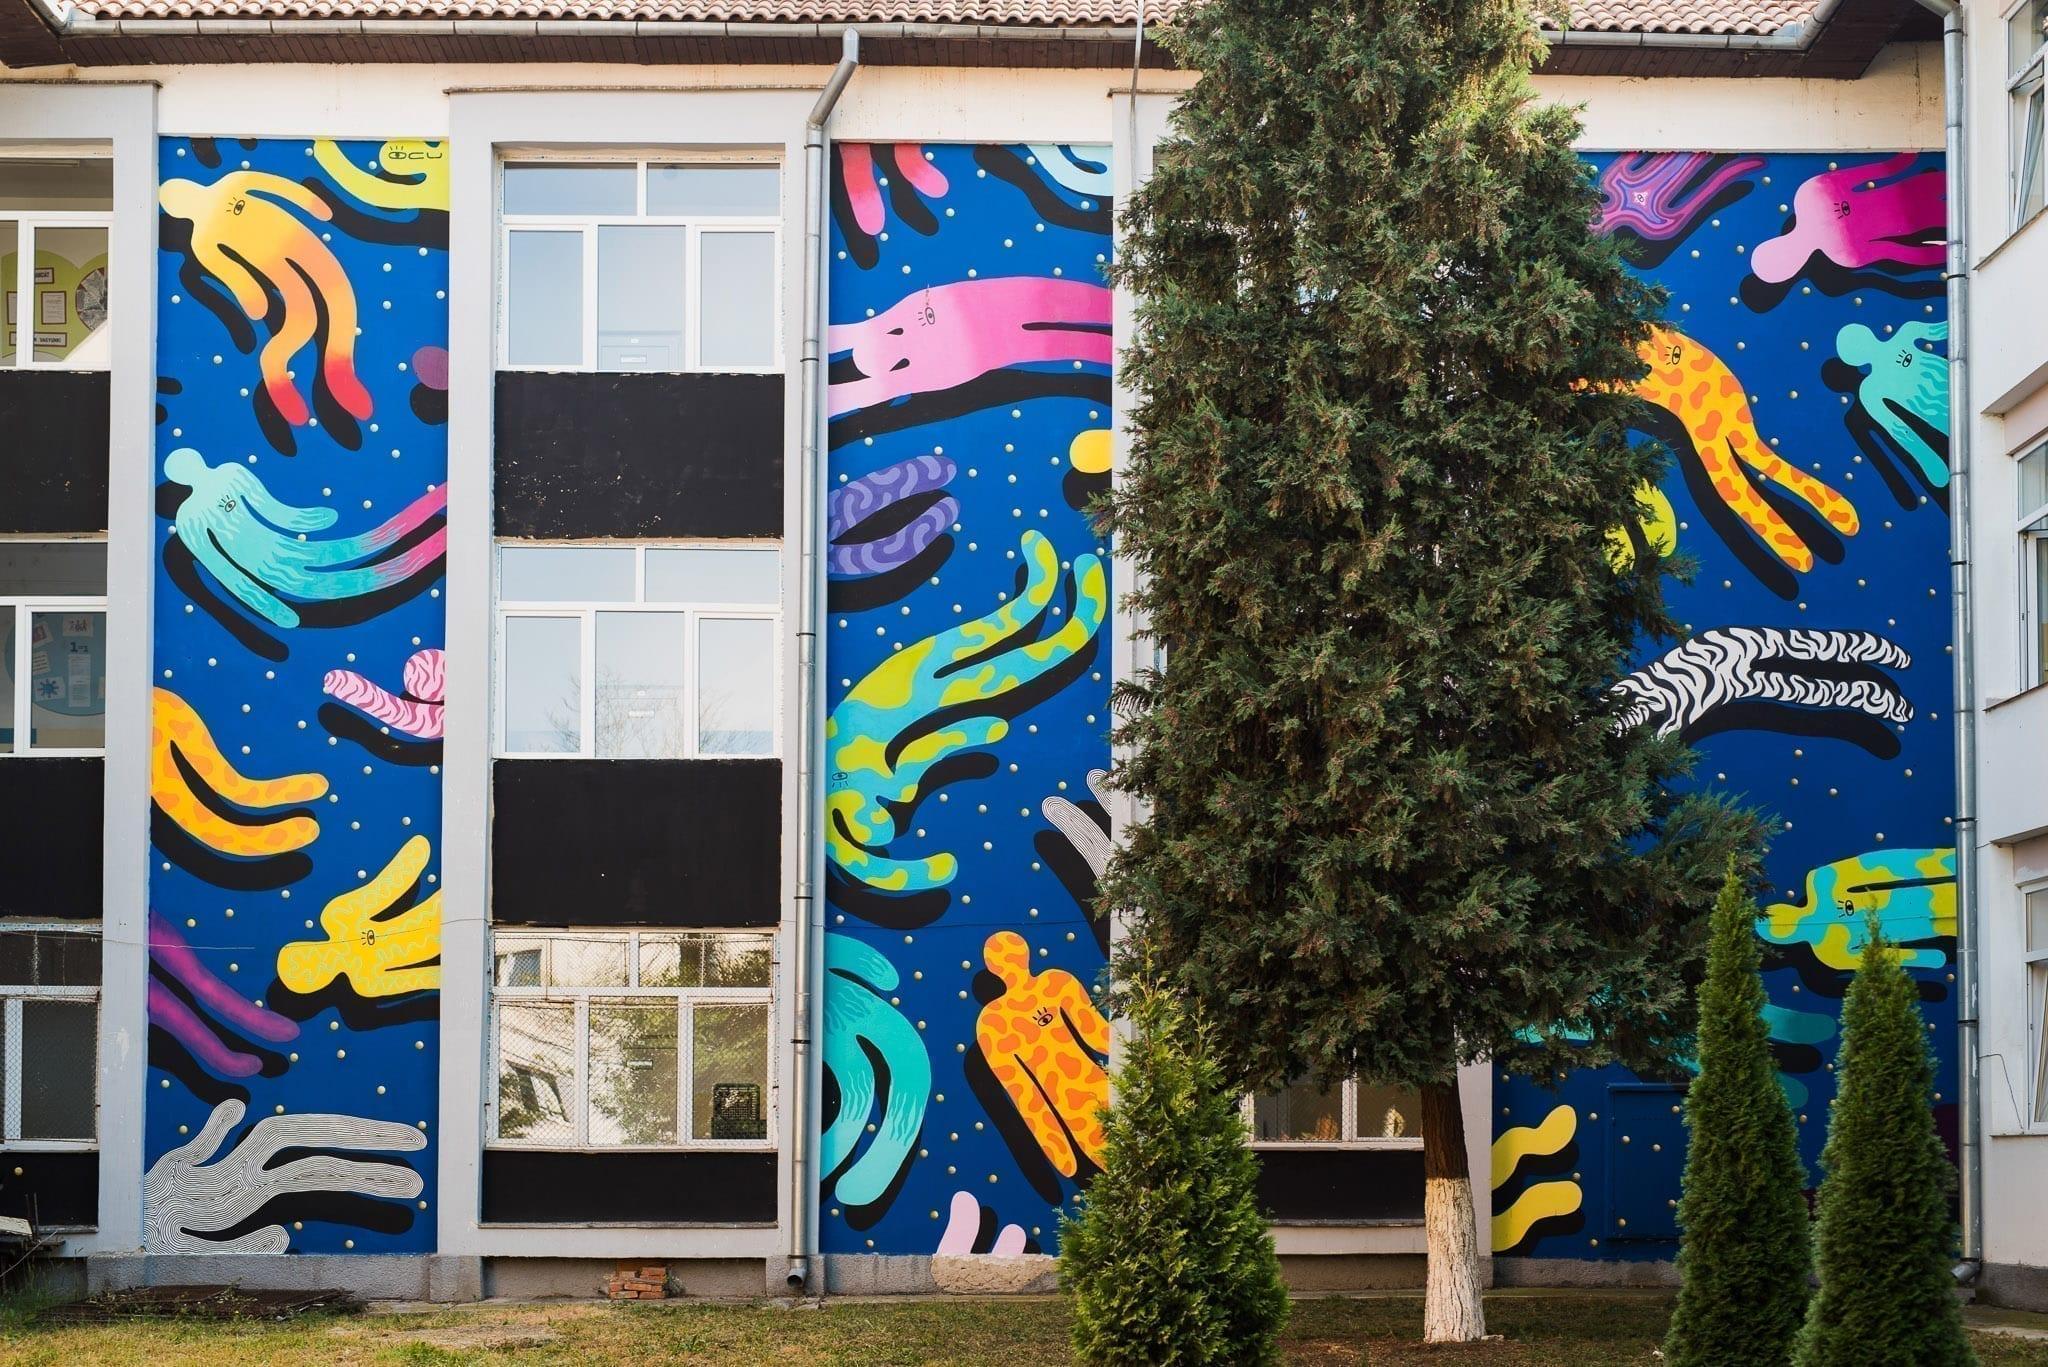 Ocu @ Școala Gimnazială Octavian Goga, Cluj photo © Un-hidden Street Art in Romania book, taken by Anita Jambor, Un-hidden Romania